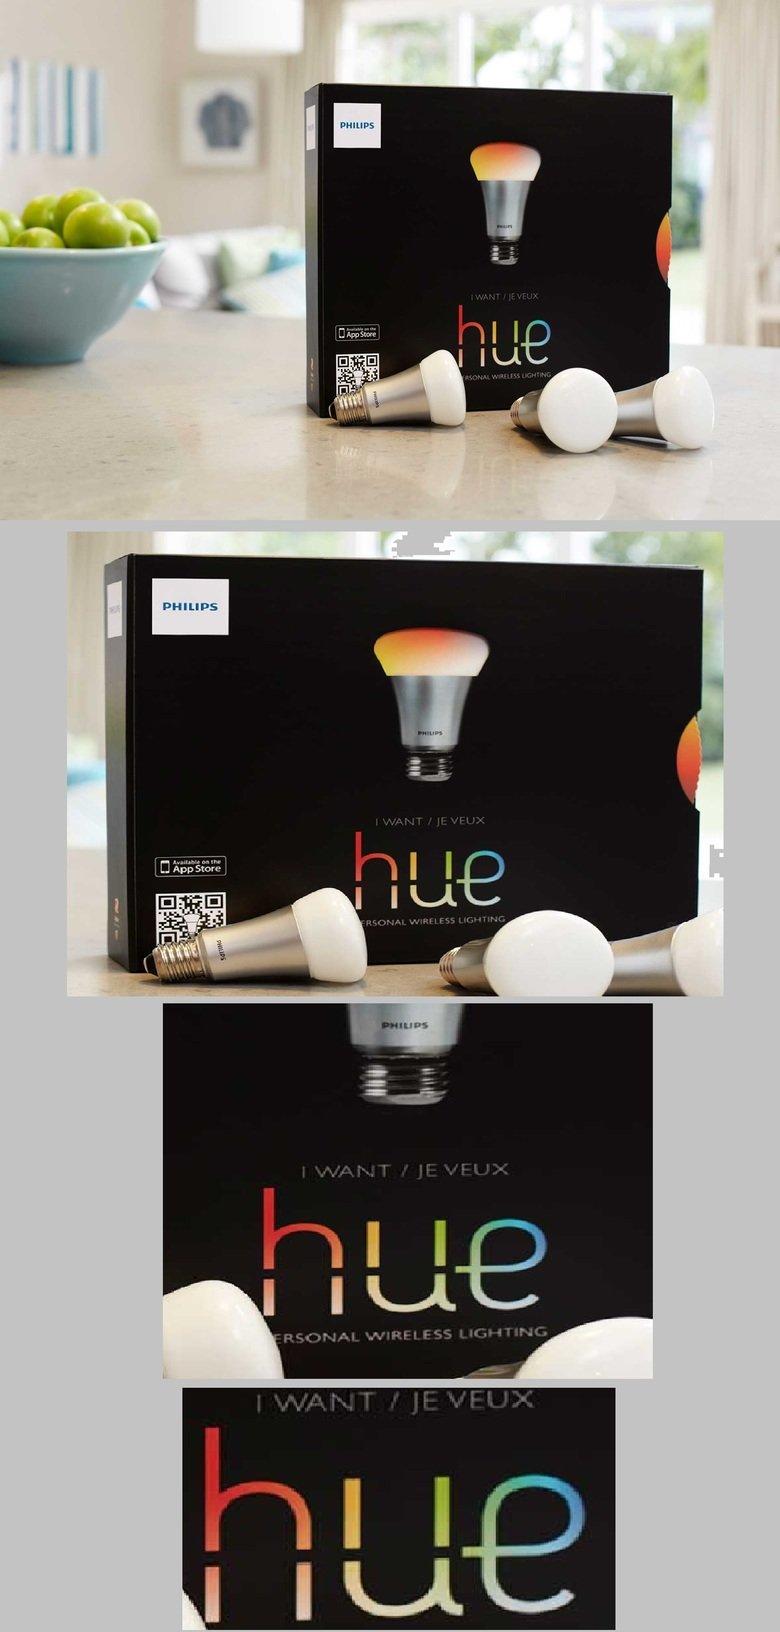 I want HUE. Best.product.name.EVAH!!!.. No, this is hue. HUEHUEHUEHUEHUEH